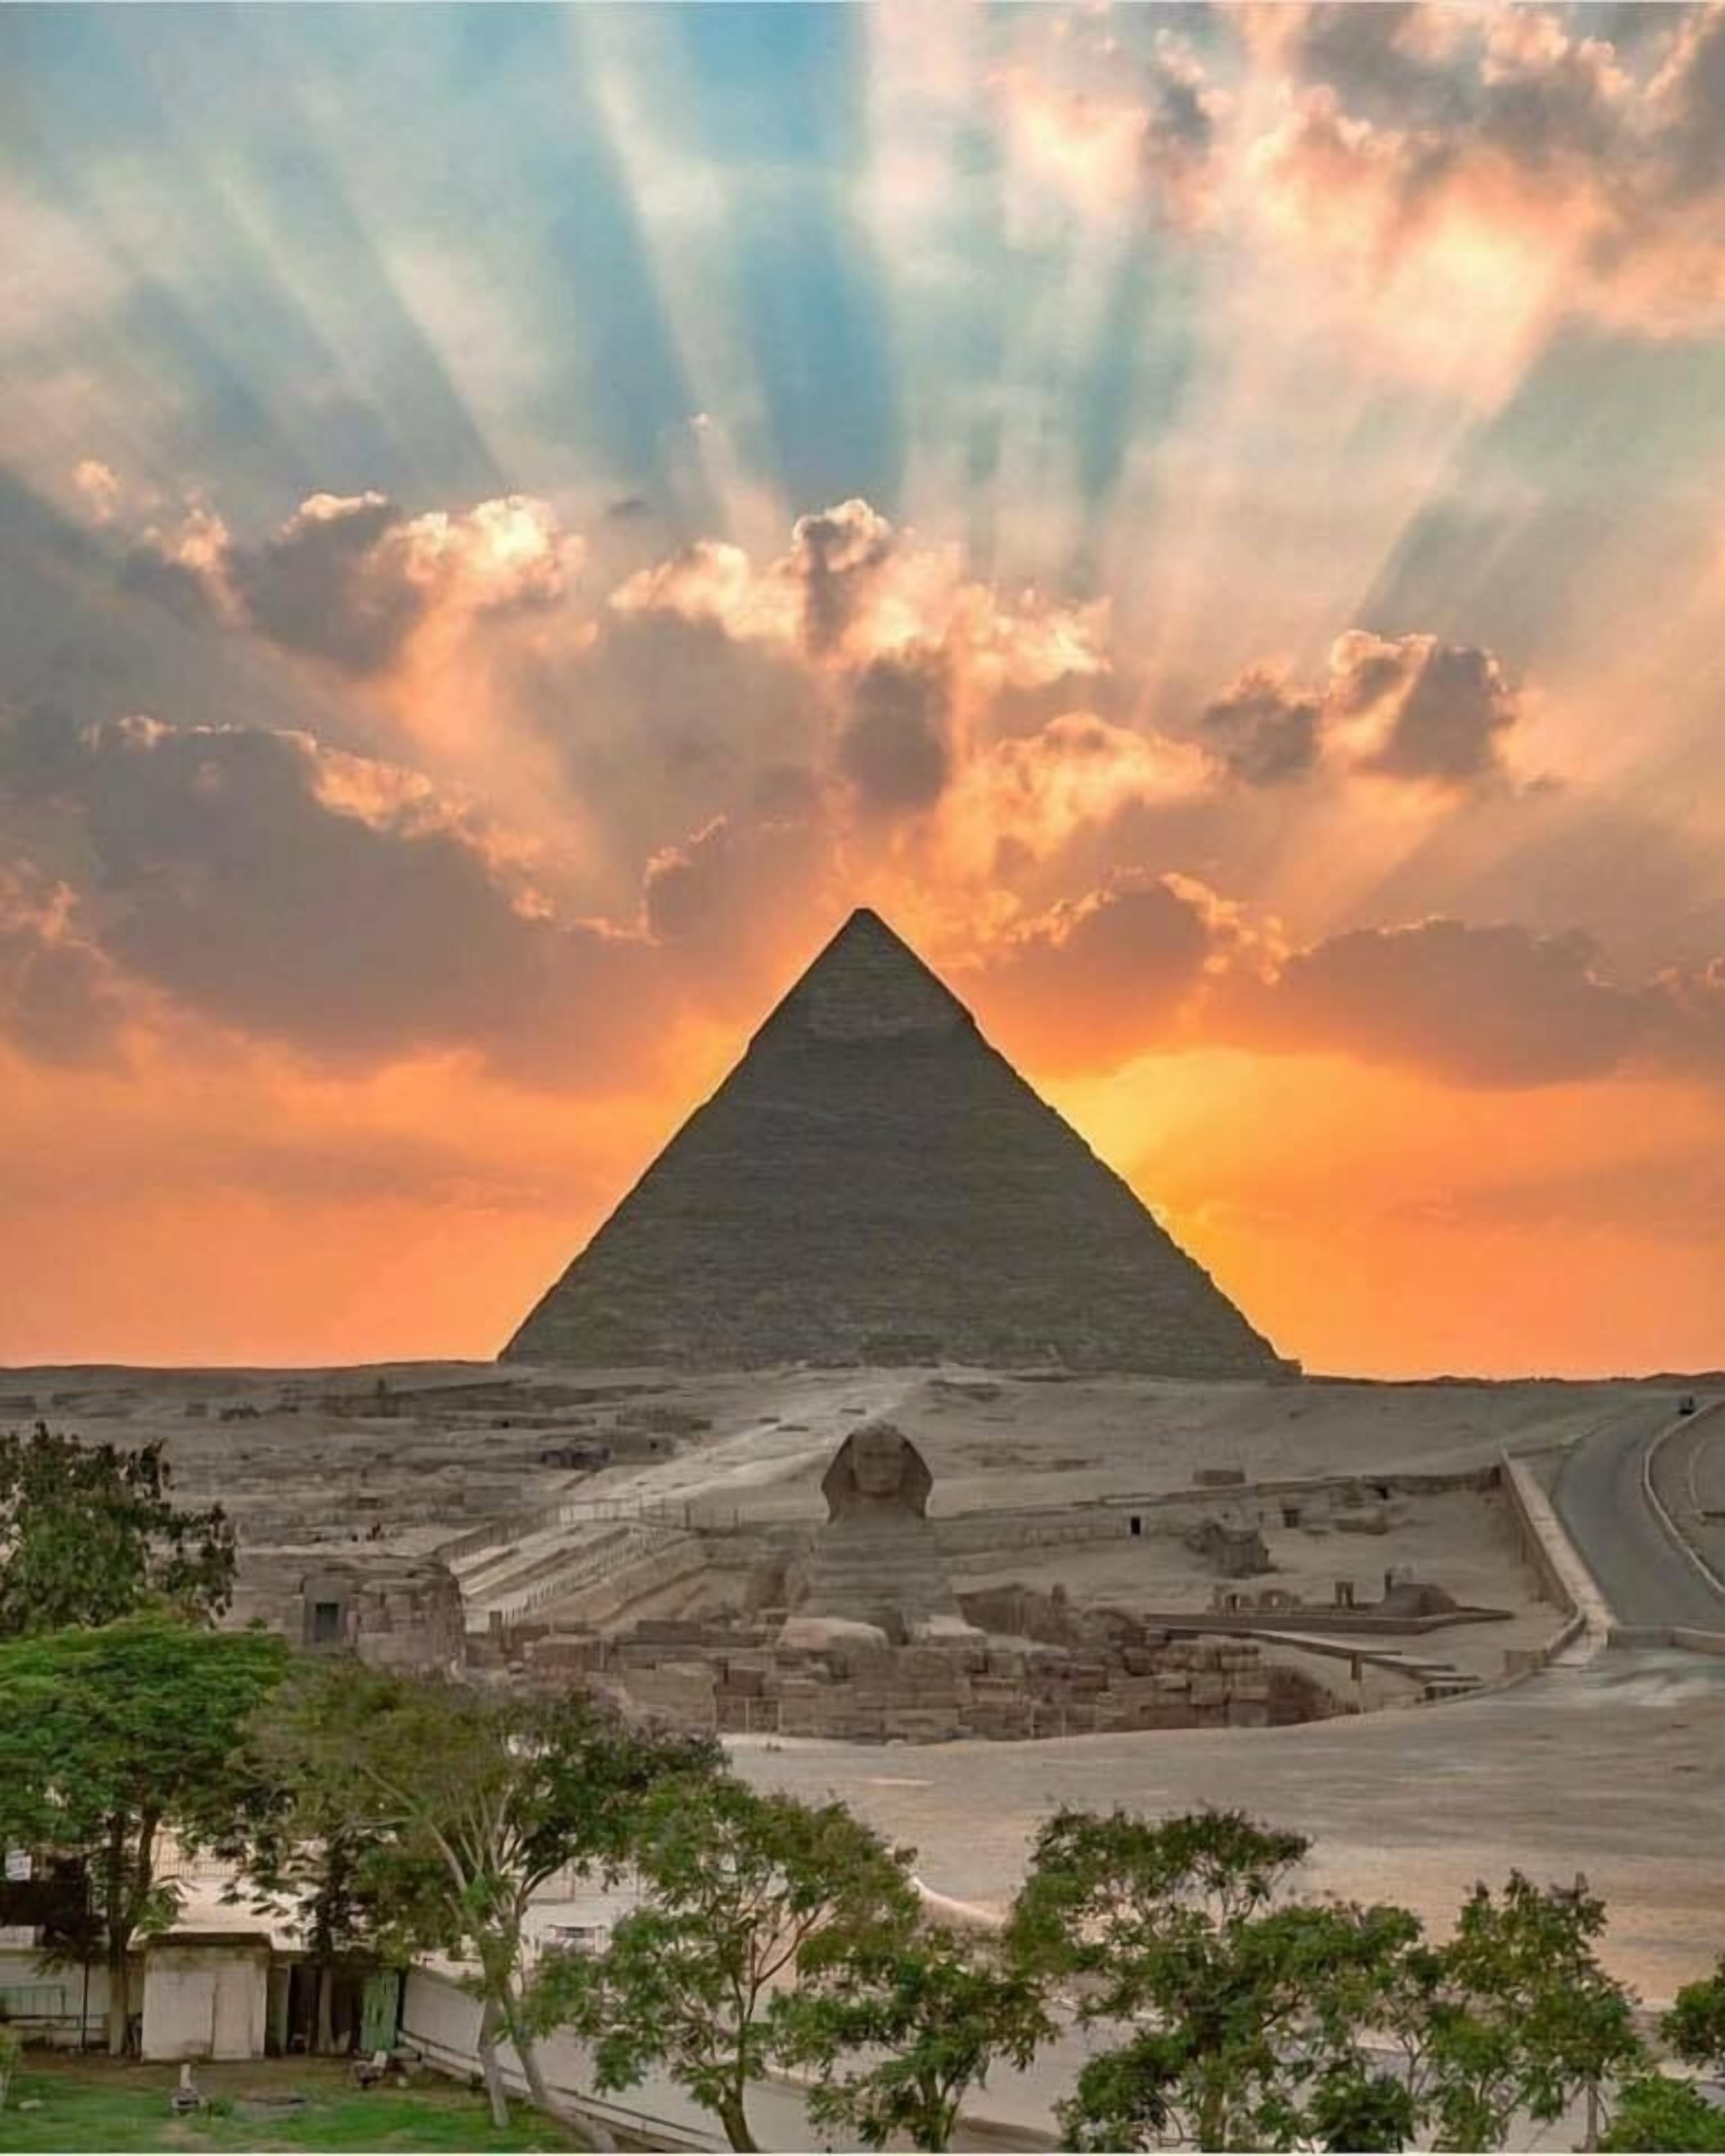 Pyramids View Inn Bed & Breakfast